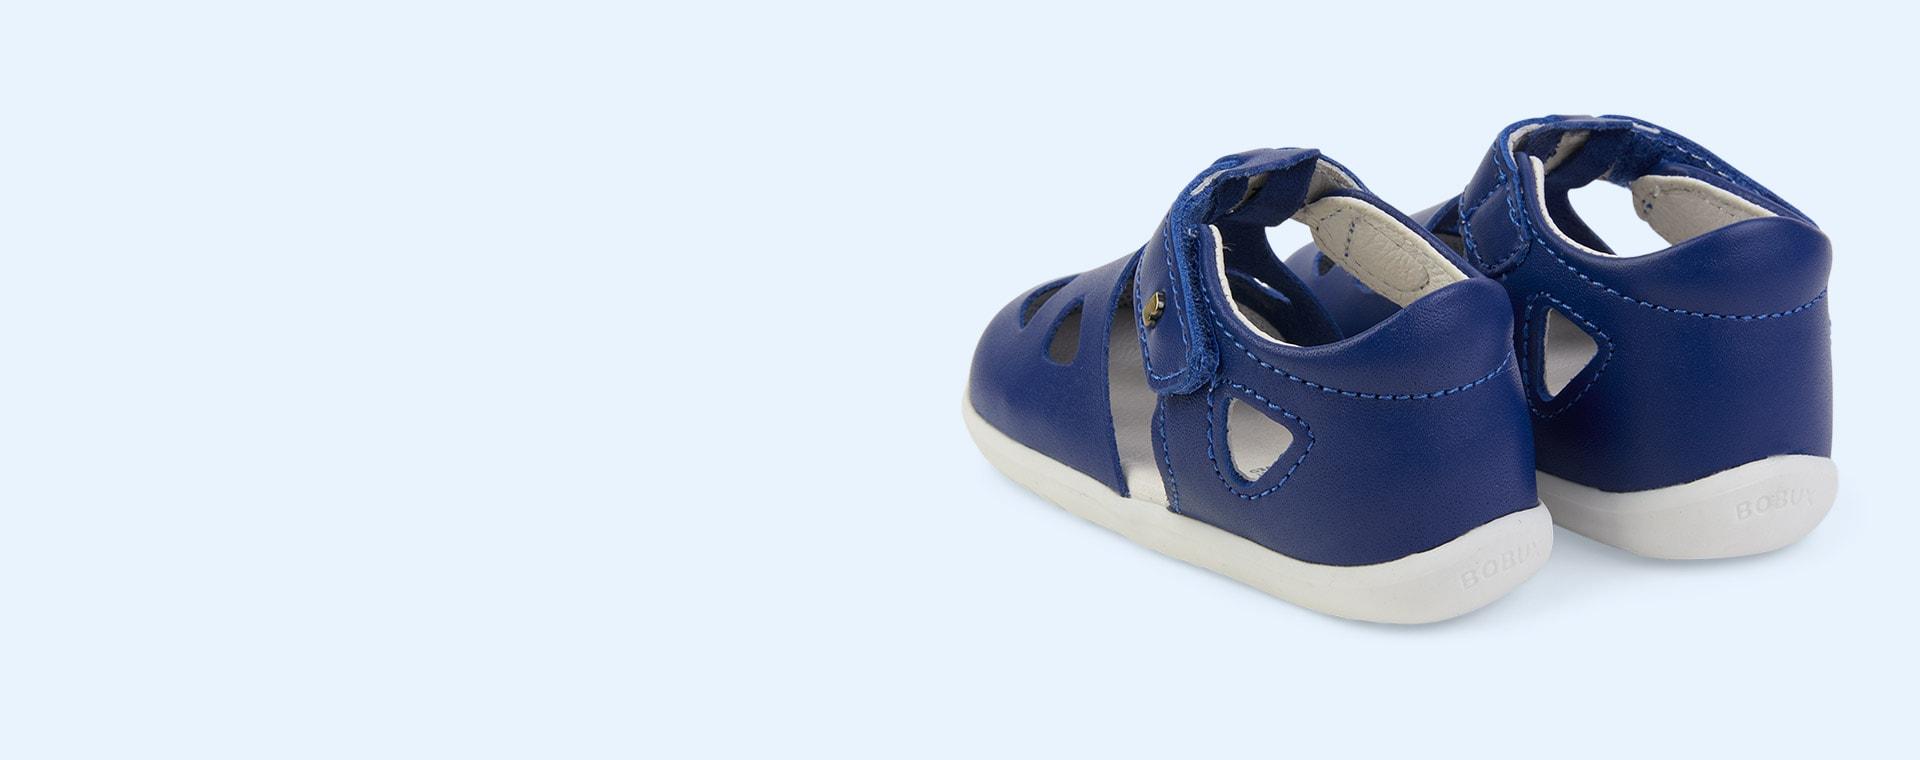 Blueberry Bobux Step Up Classic Zap Sandal